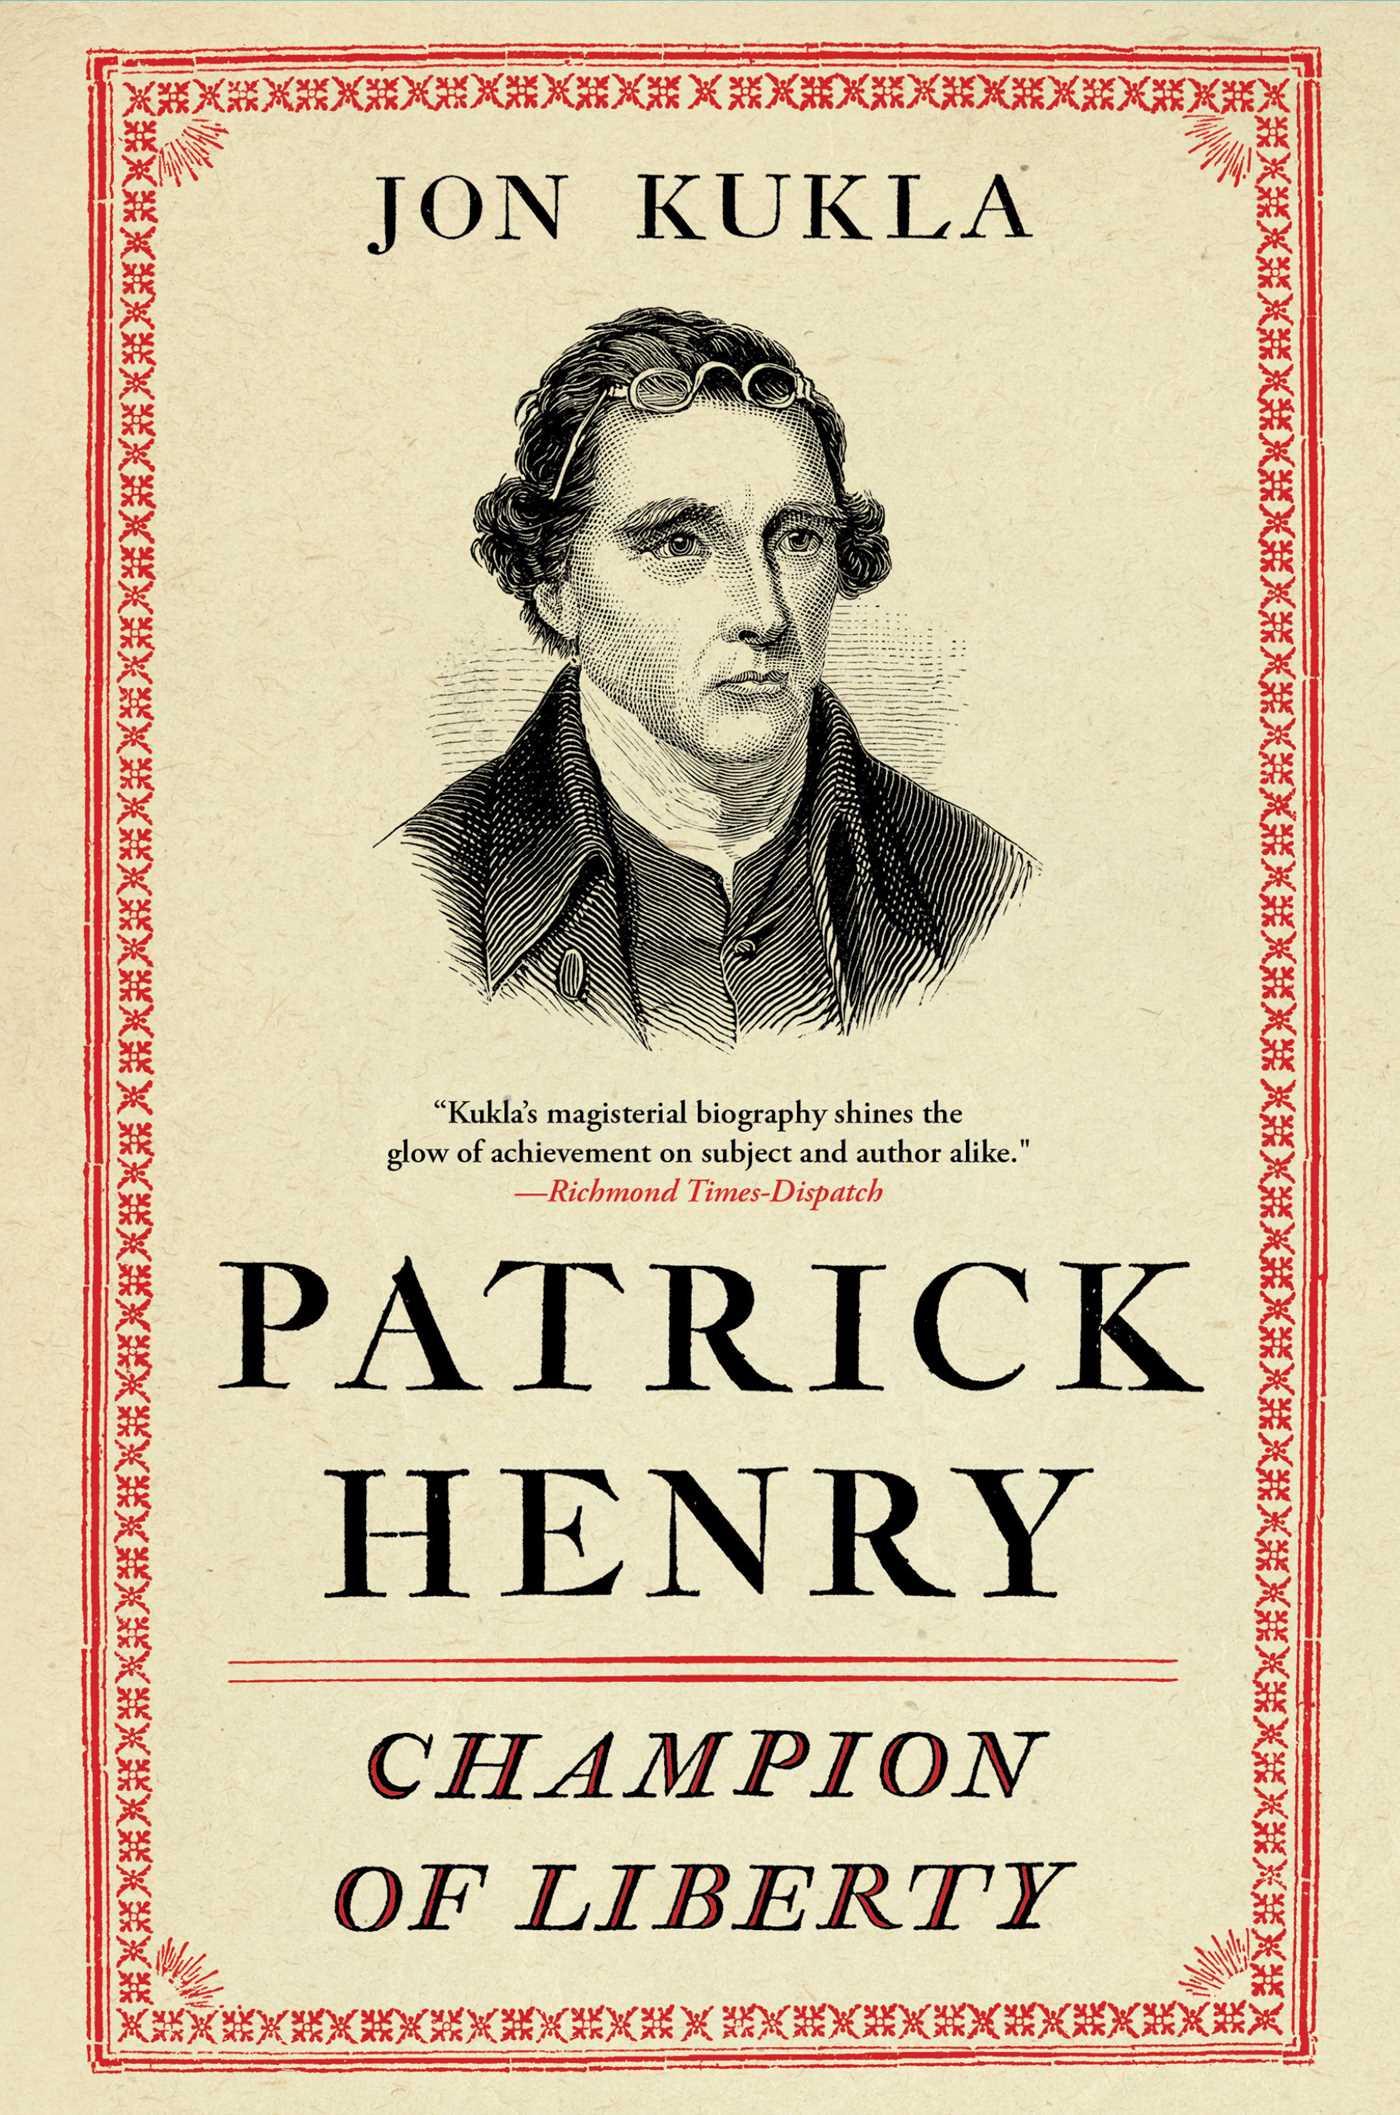 Patrick henry 9781439190821 hr